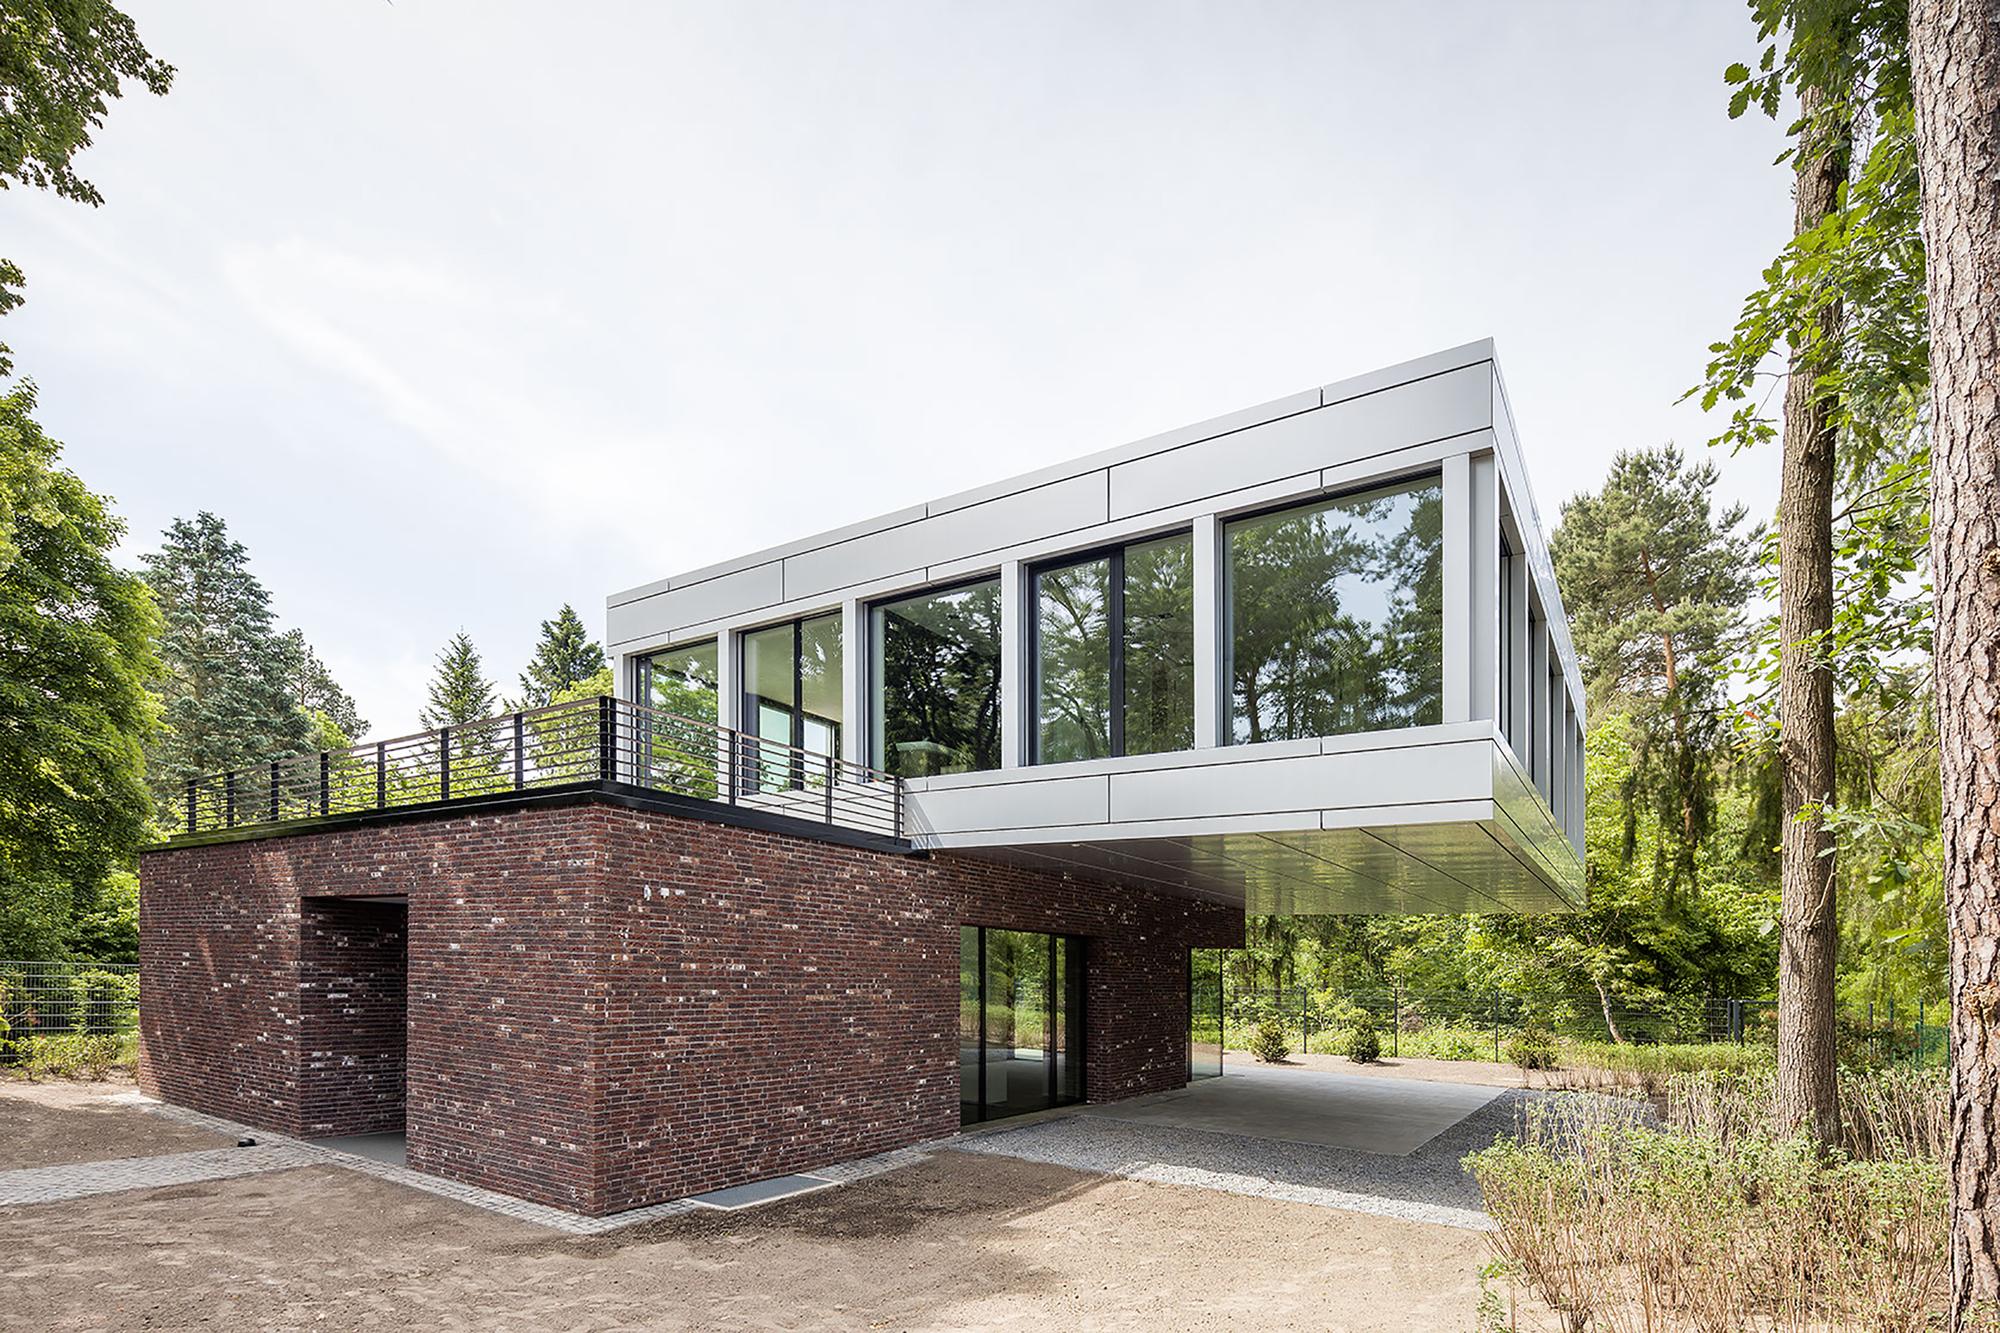 gallery of villa in potsdam tchoban voss architekten 1. Black Bedroom Furniture Sets. Home Design Ideas